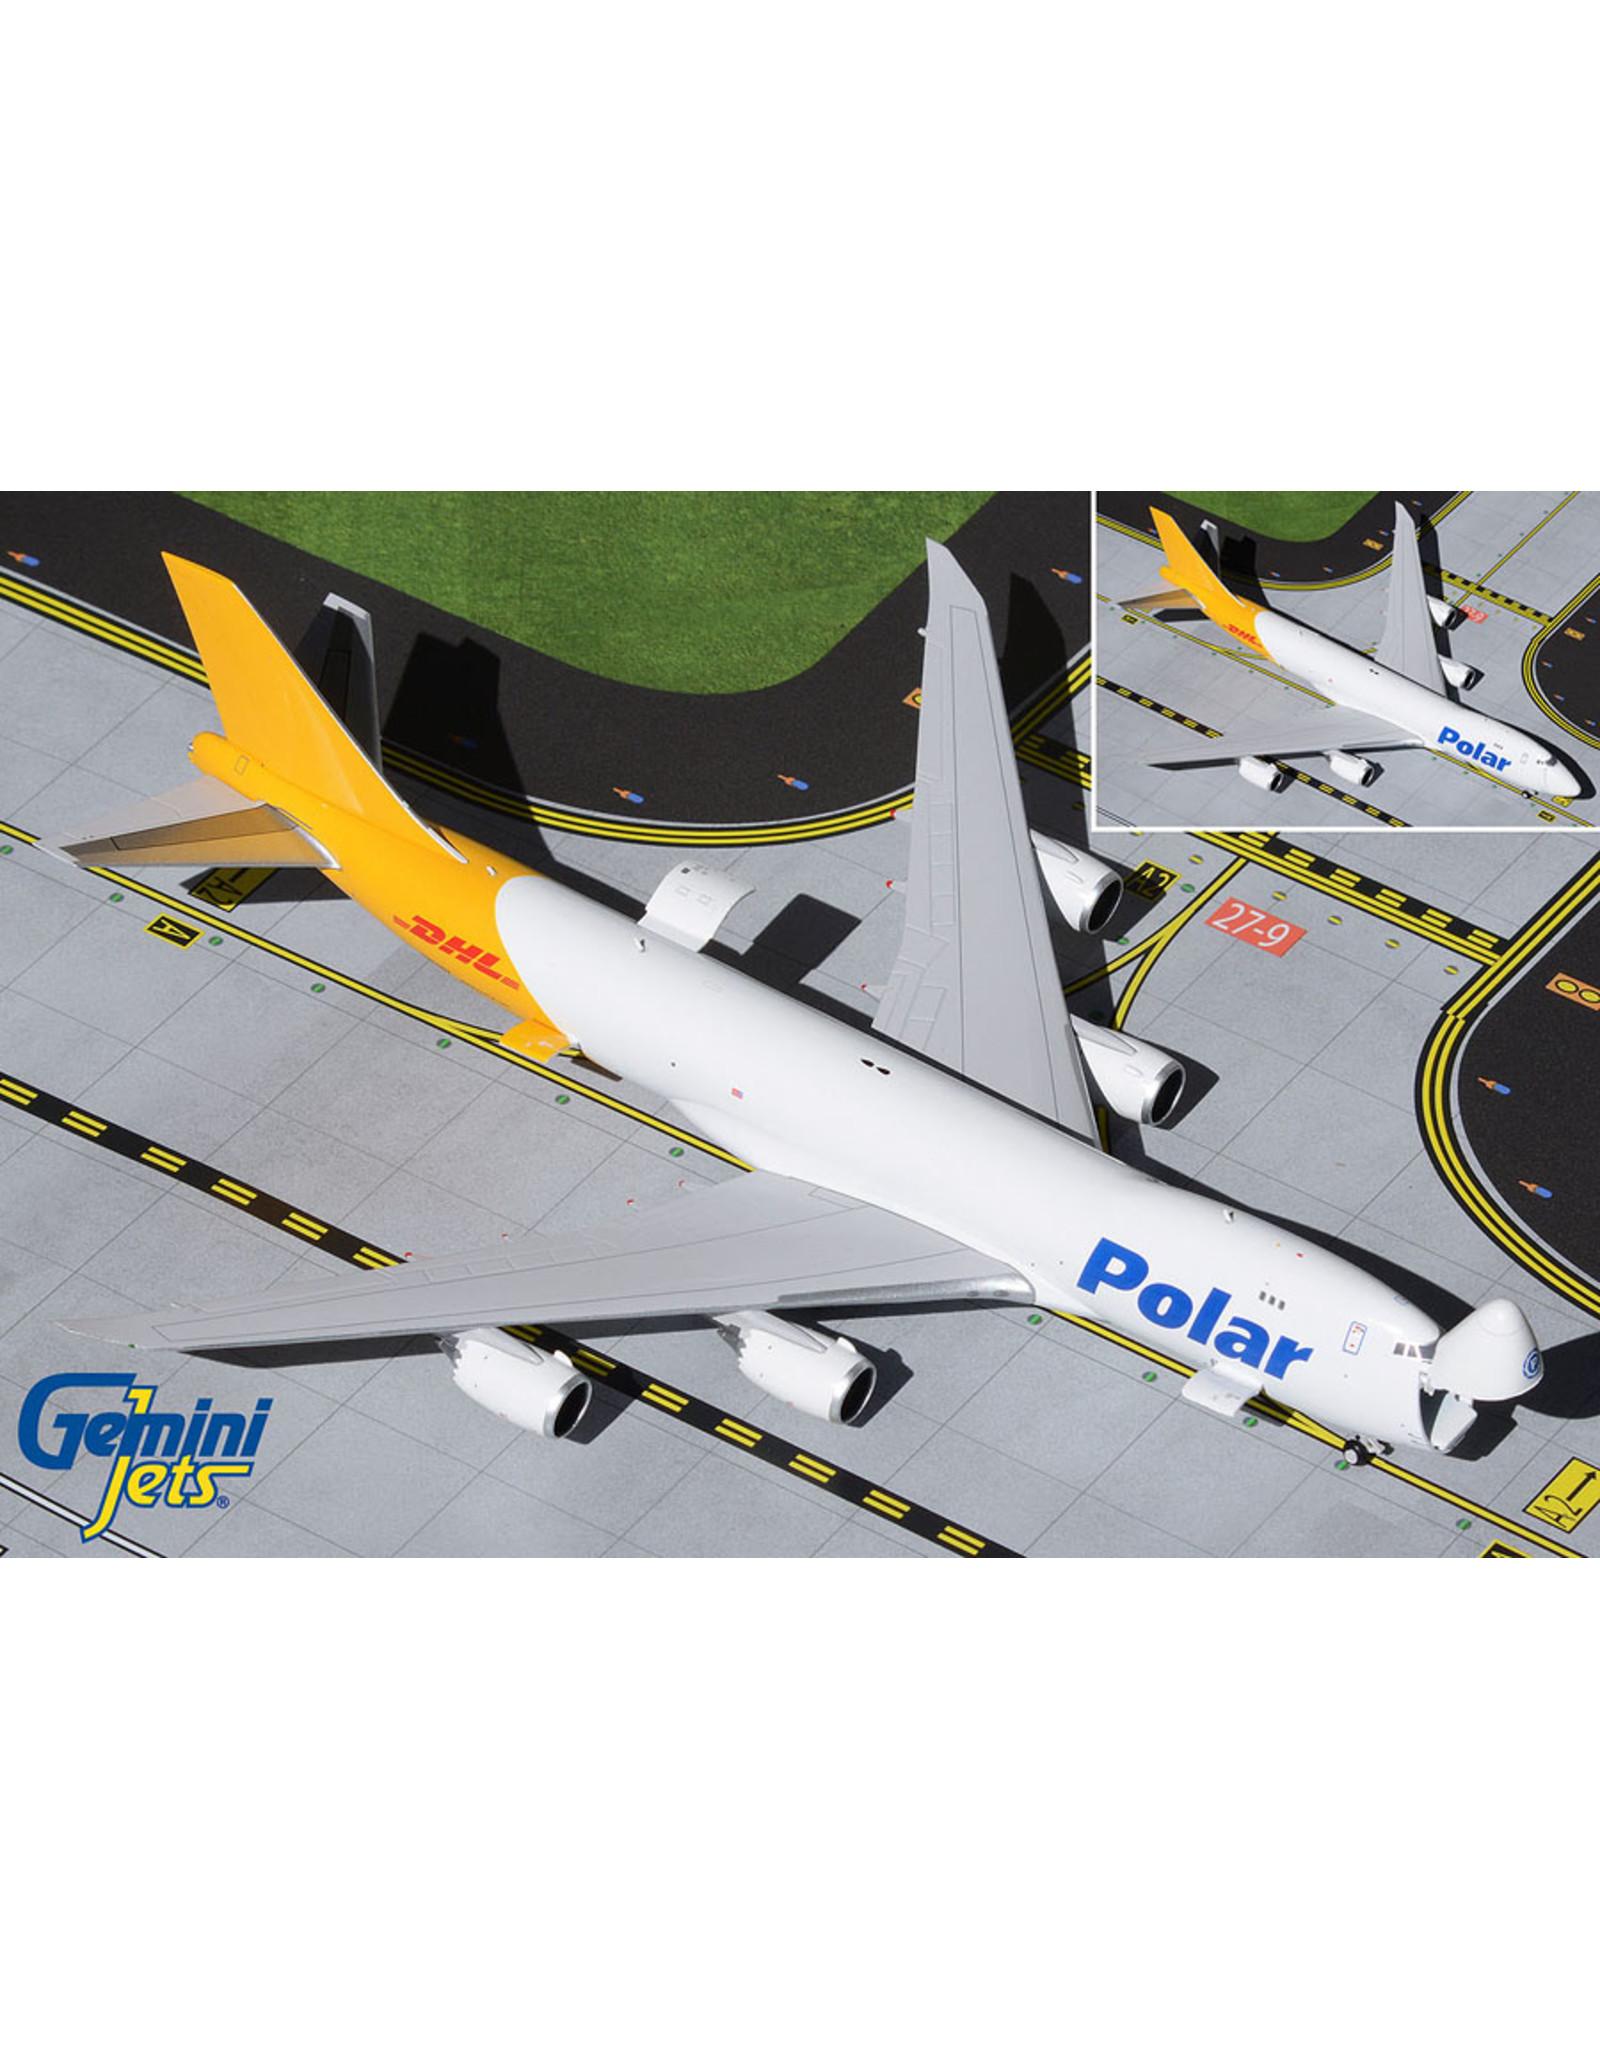 Gemini Gem4 Polar 747-8F interactive